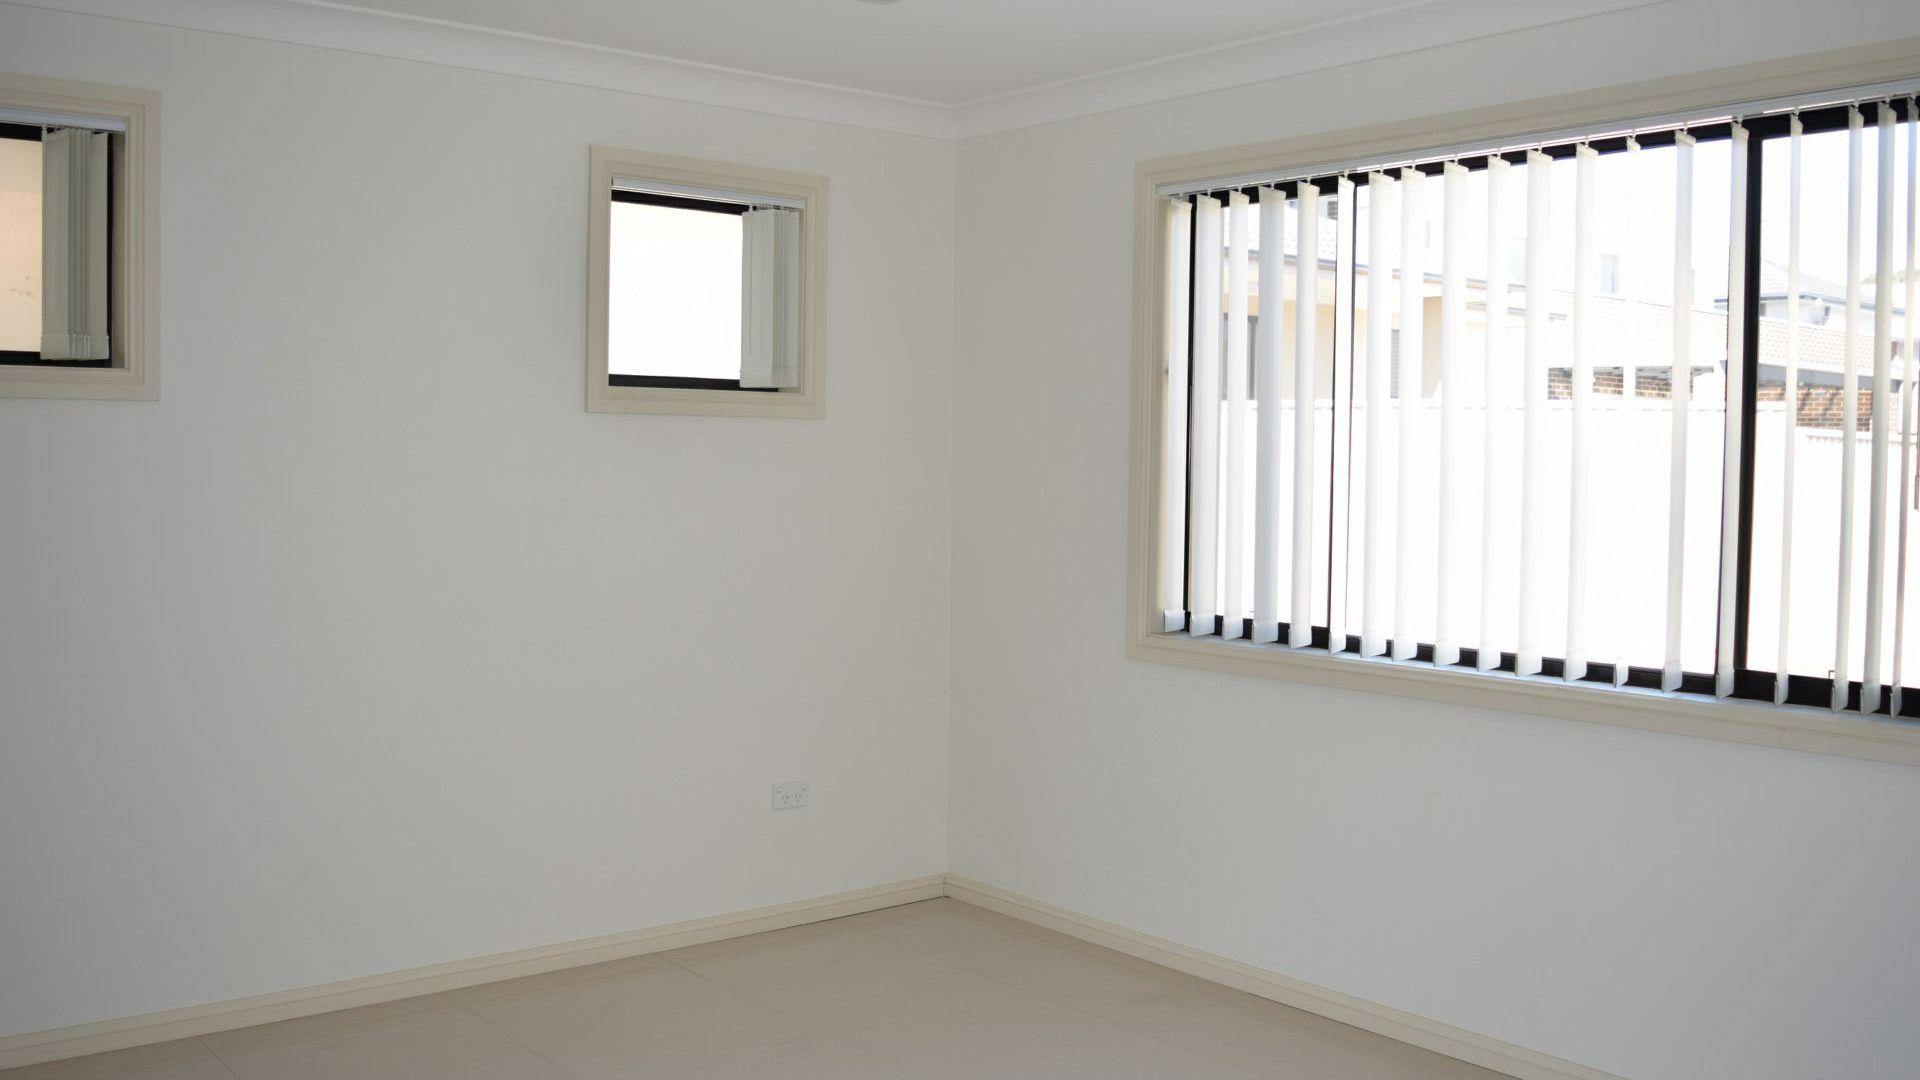 8/20 Ellis St, Condell Park NSW 2200, Image 2